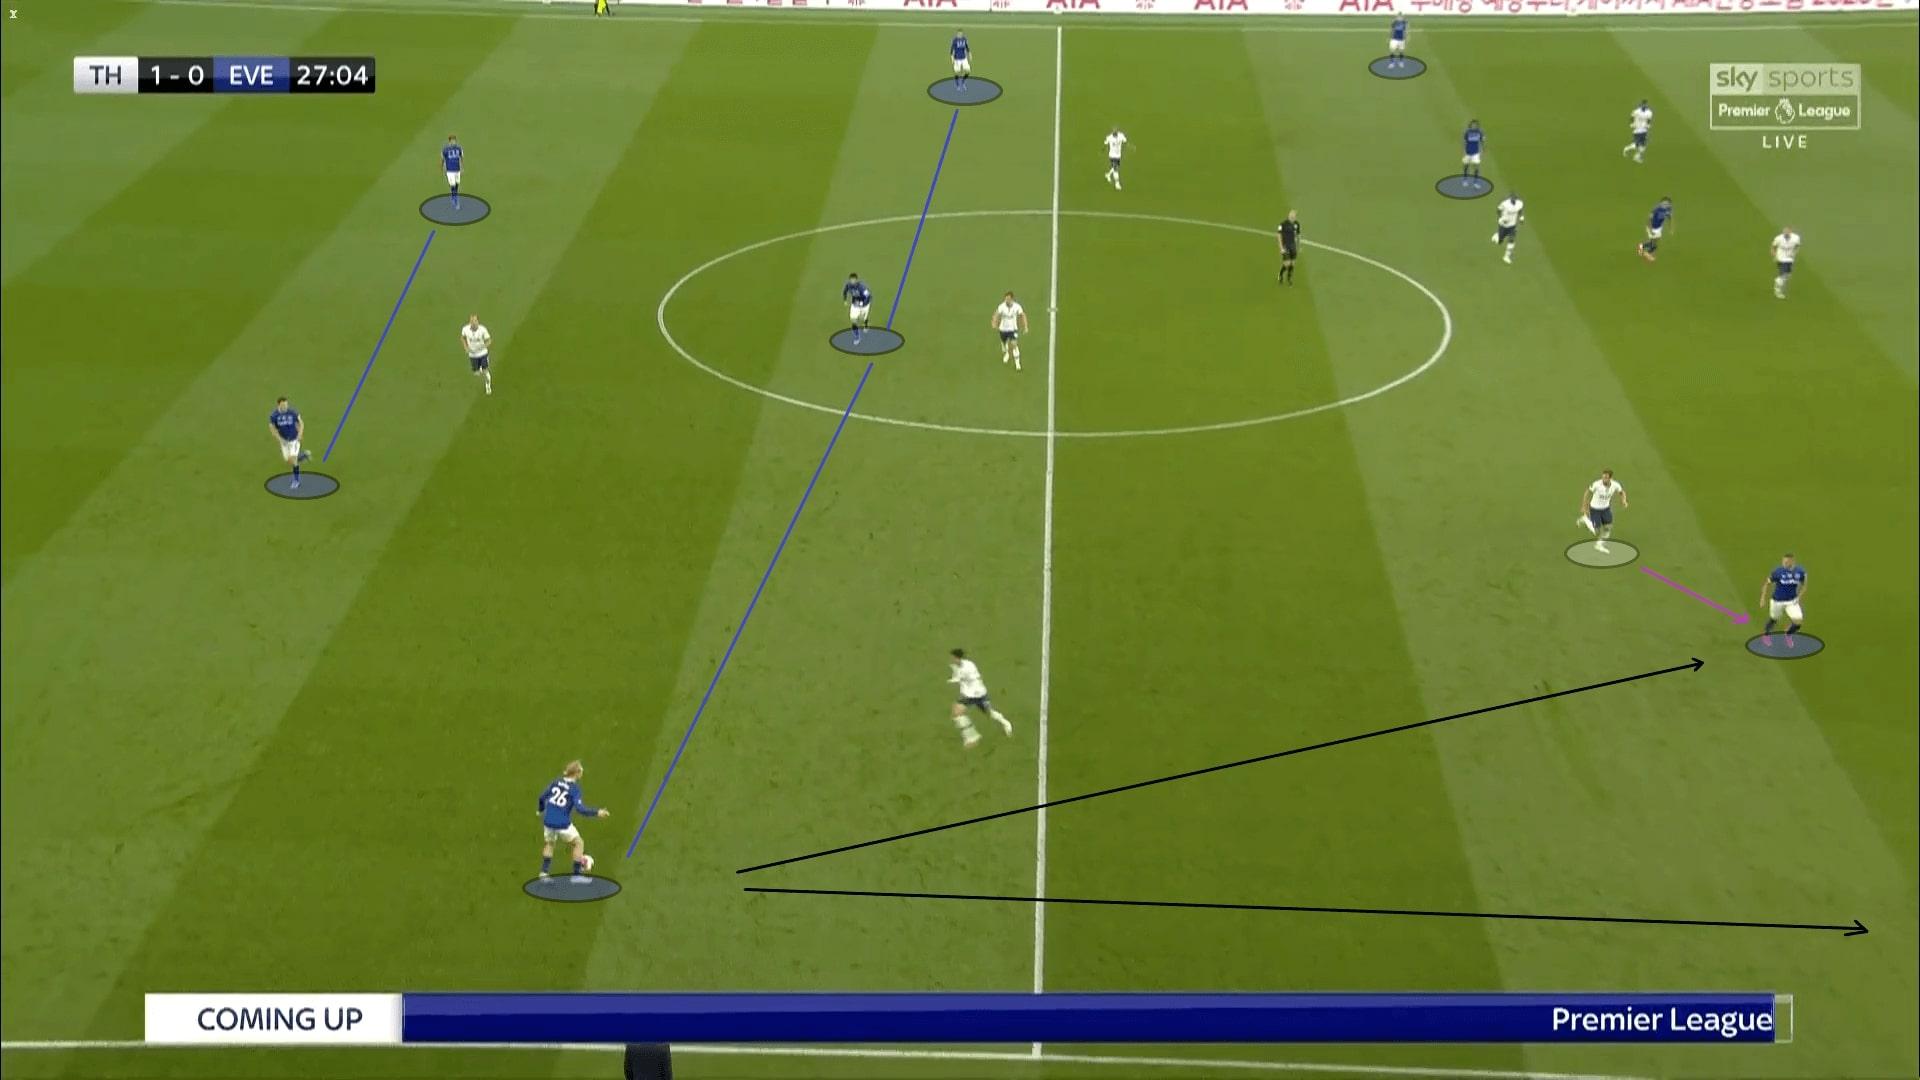 Premier League 2019/20: Tottenham vs Everton - tactical analysis tactics